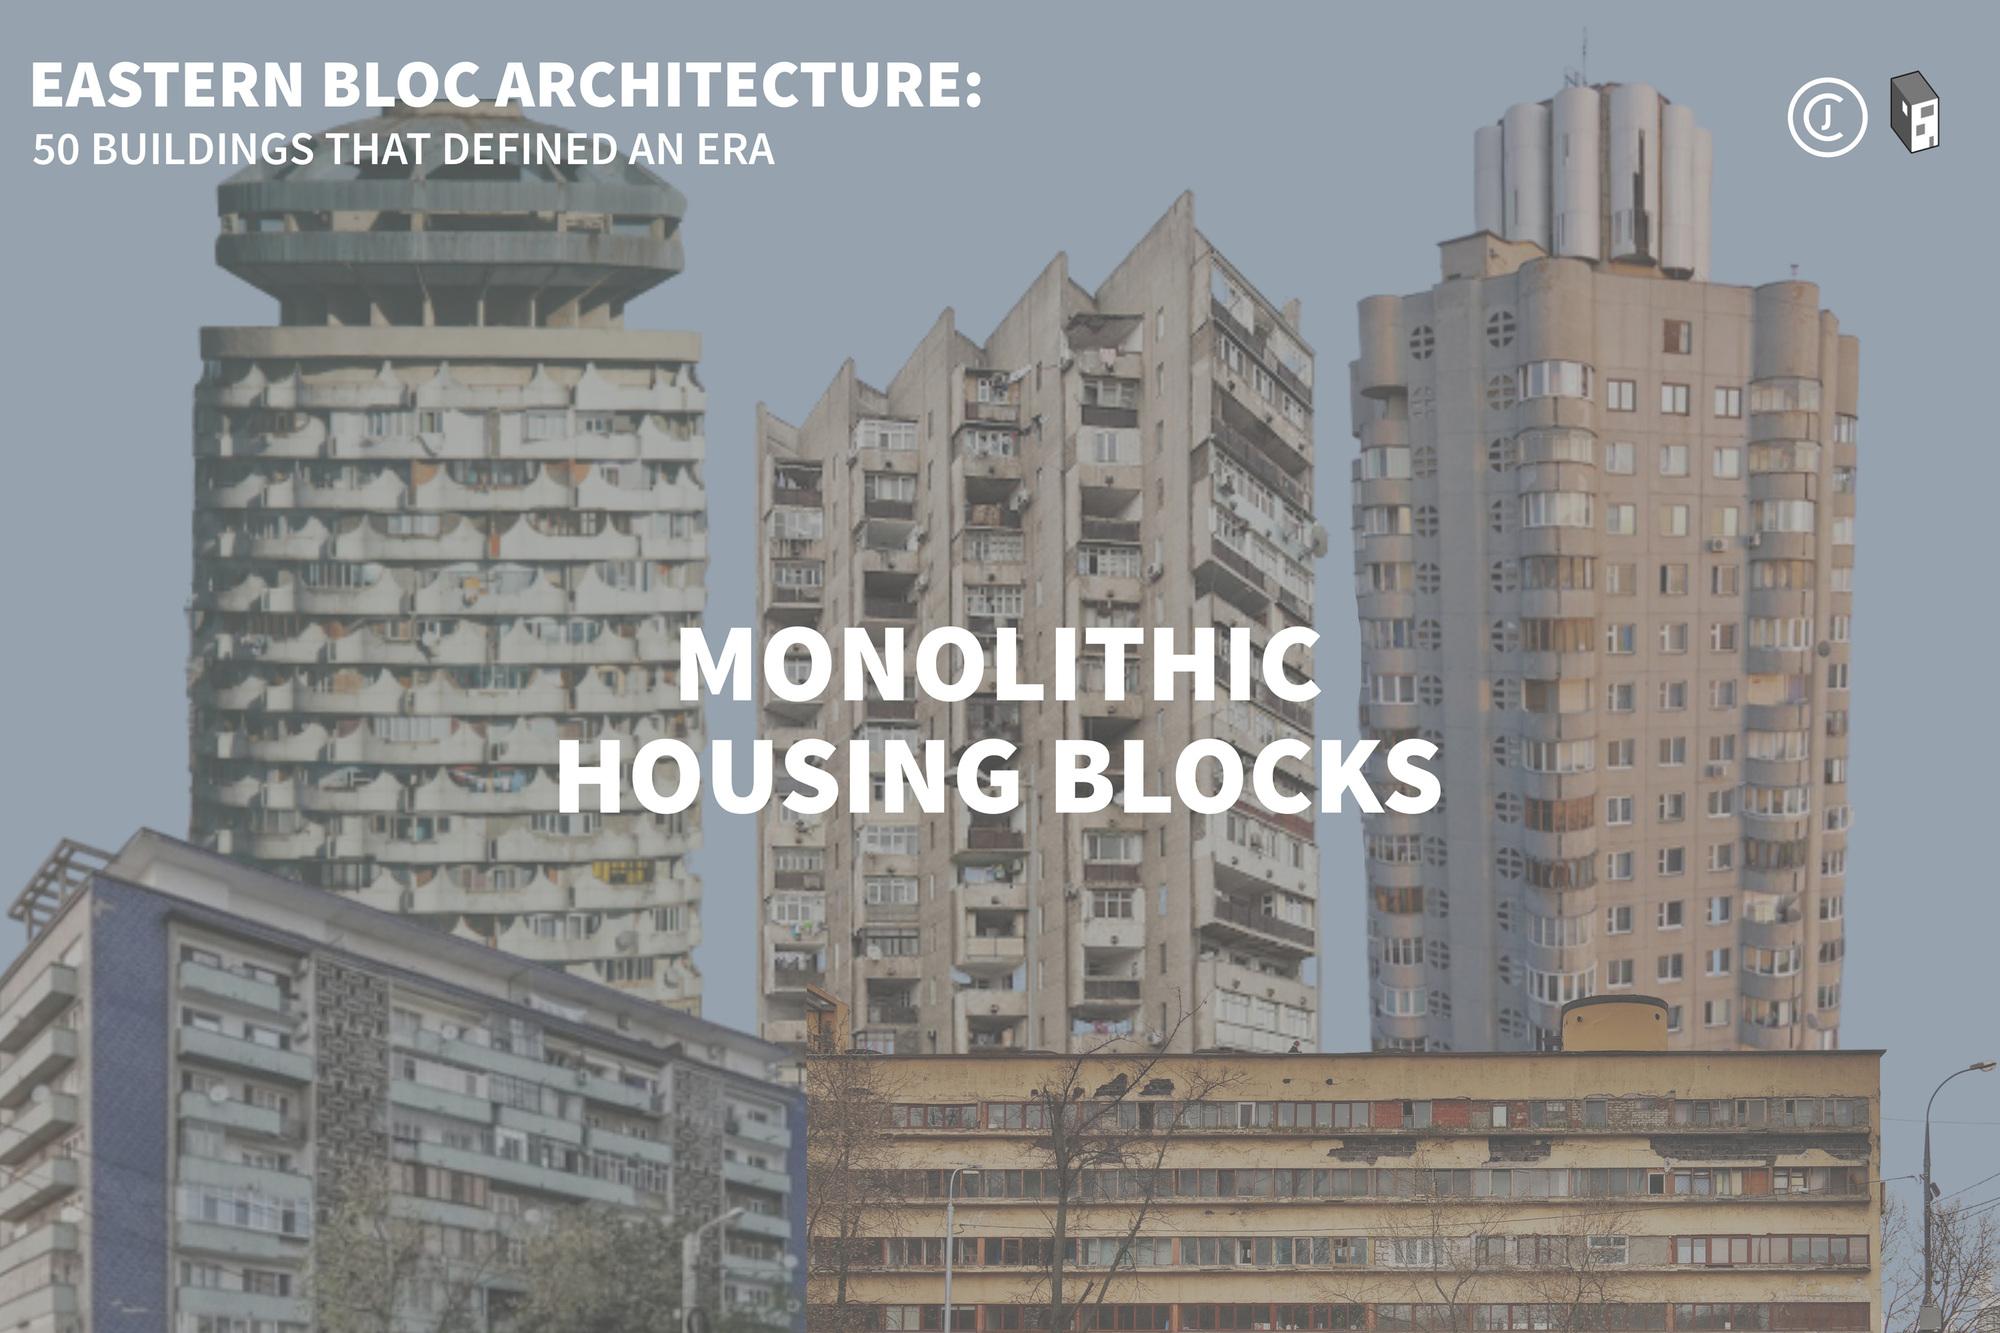 Eastern Bloc Buildings: Monolithic Housing Blocks